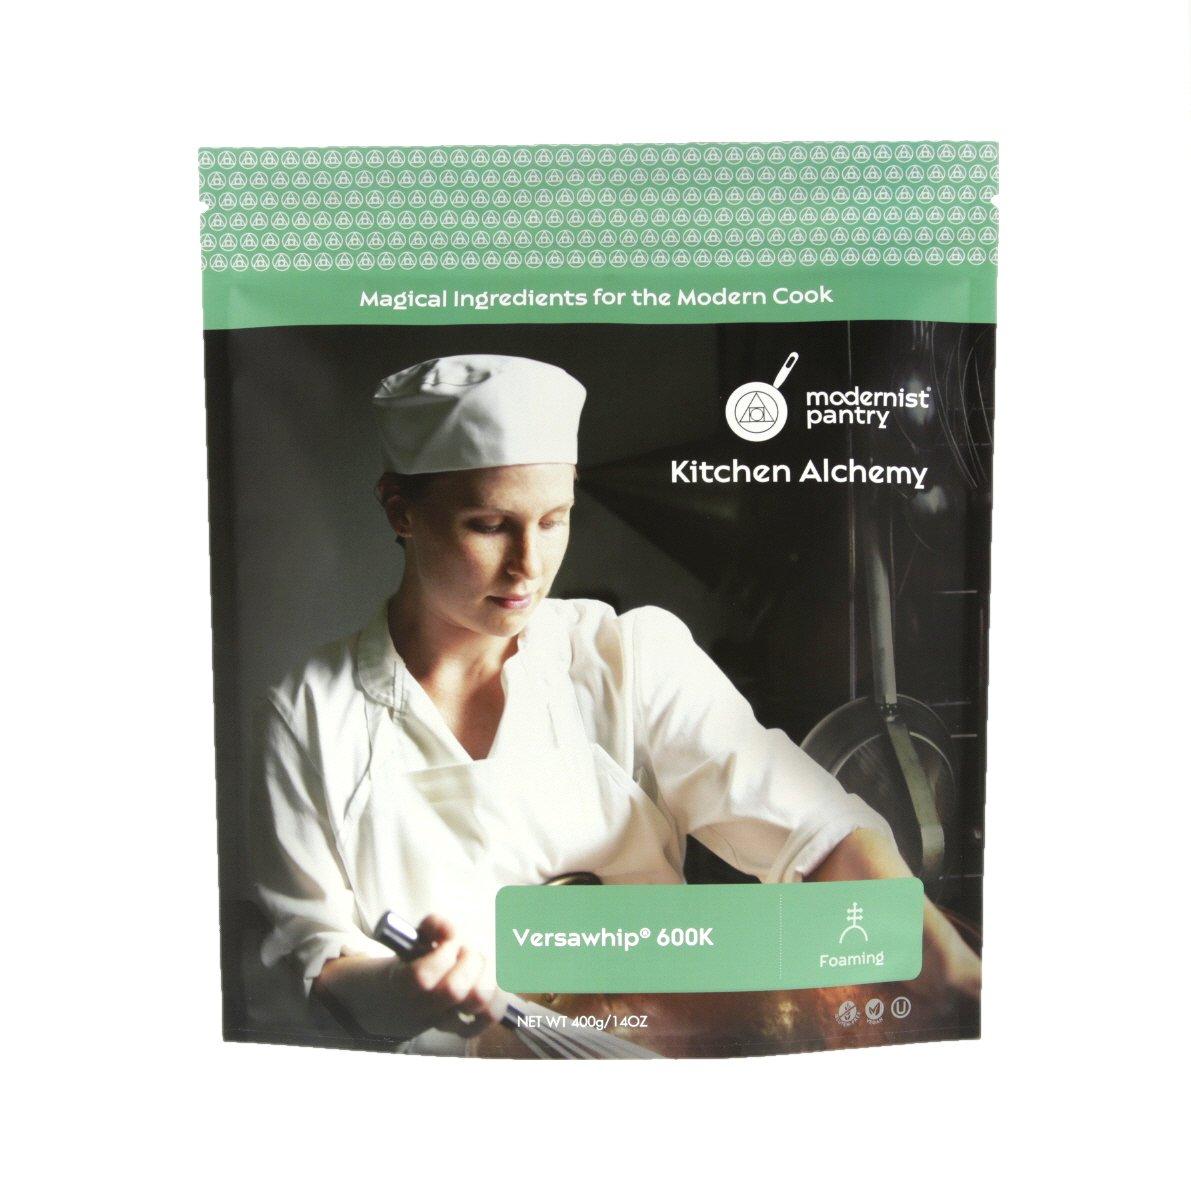 Food Grade VersaWhip 600K (Molecular Gastronomy) ☮ Vegan ✡ OU Kosher Certified - 400g/14oz